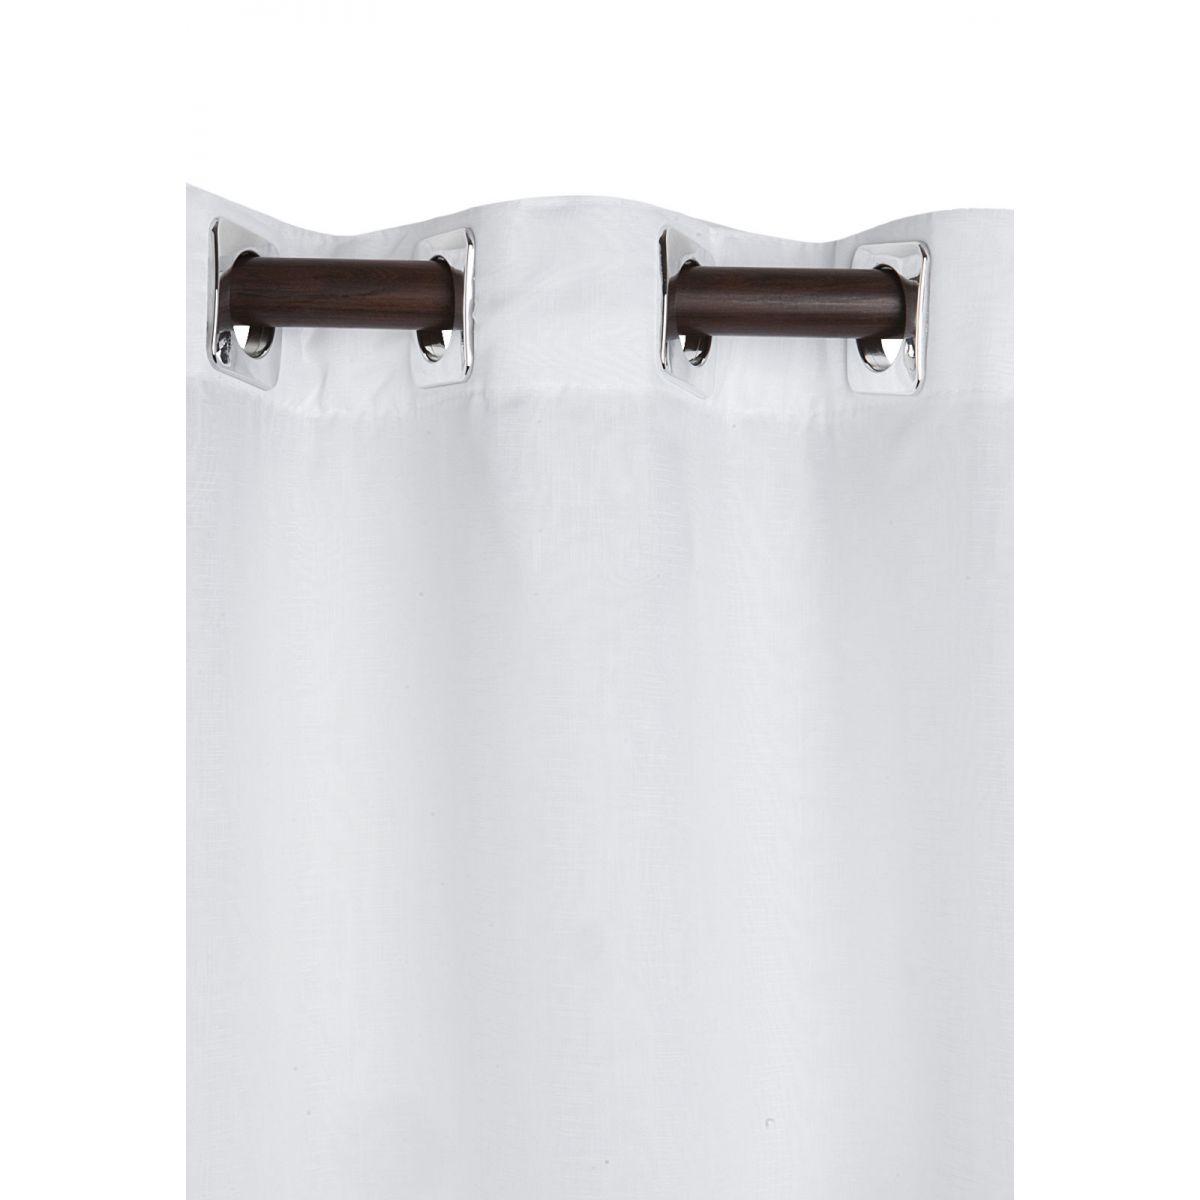 Cortina Blackout De Tecido Quarto/Sala 3,00x2,50 Branca | Admirare